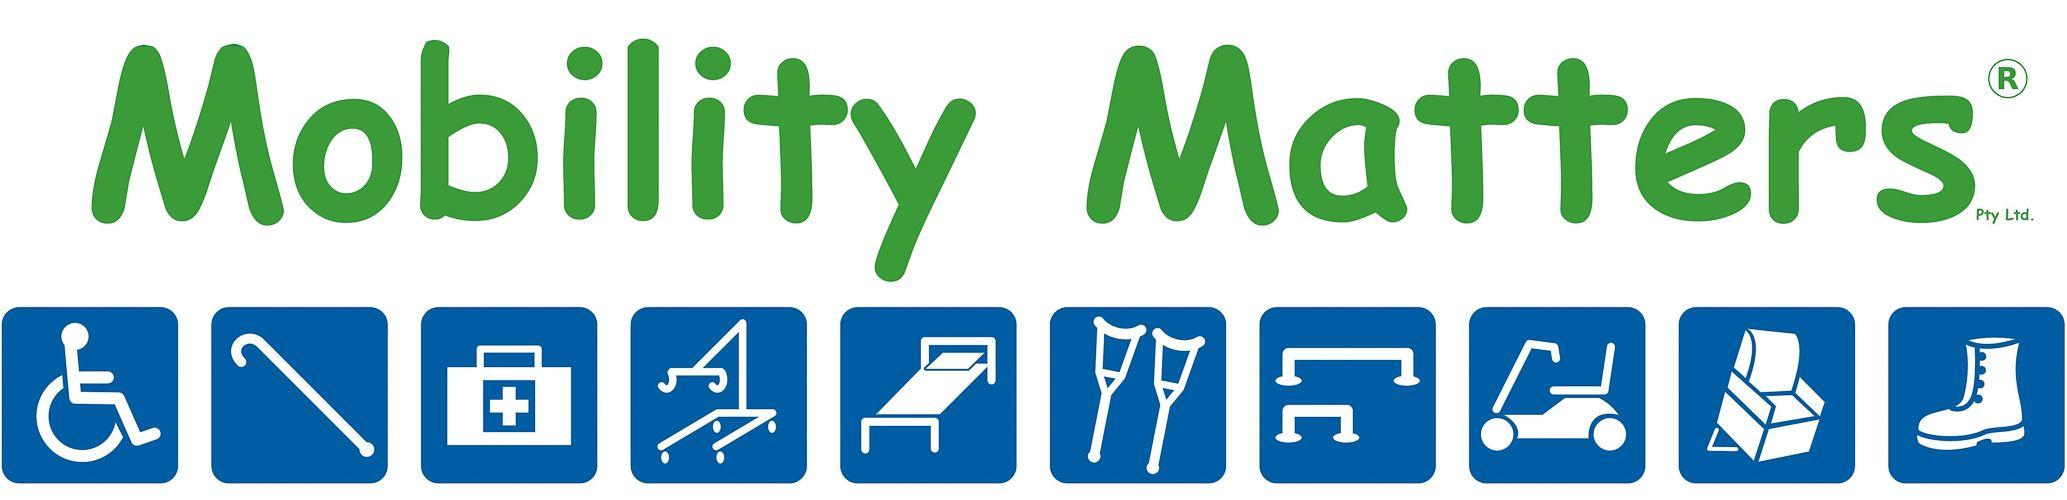 Mobility Matters Logo.jpg